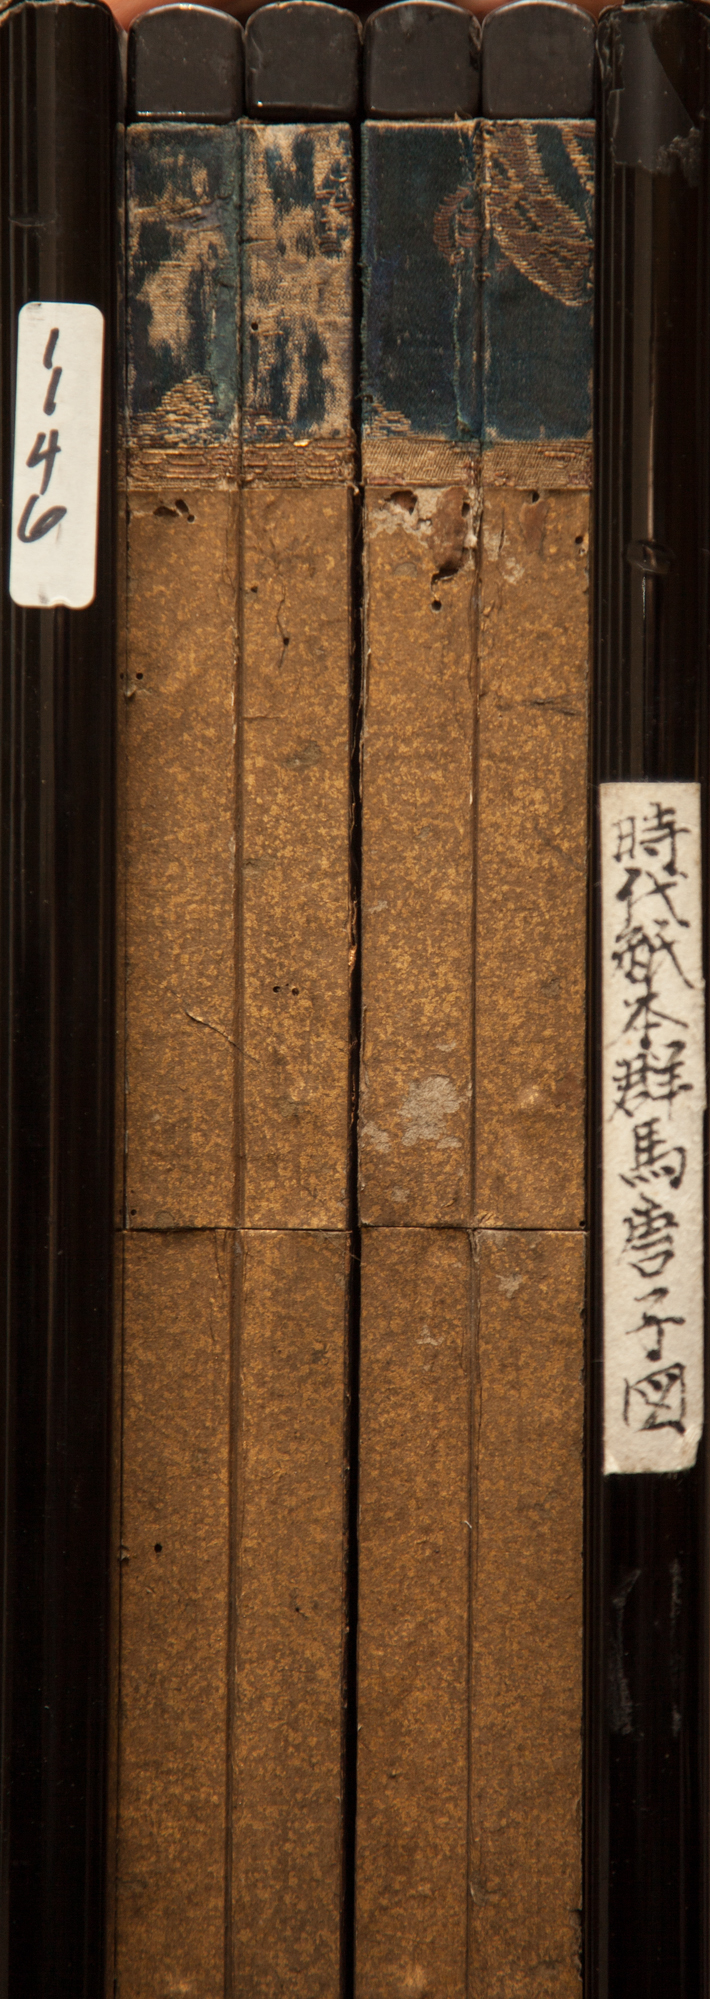 Japanese Six Panel Screen: Frolicking Horses From Chokaro Sennin's Gourd